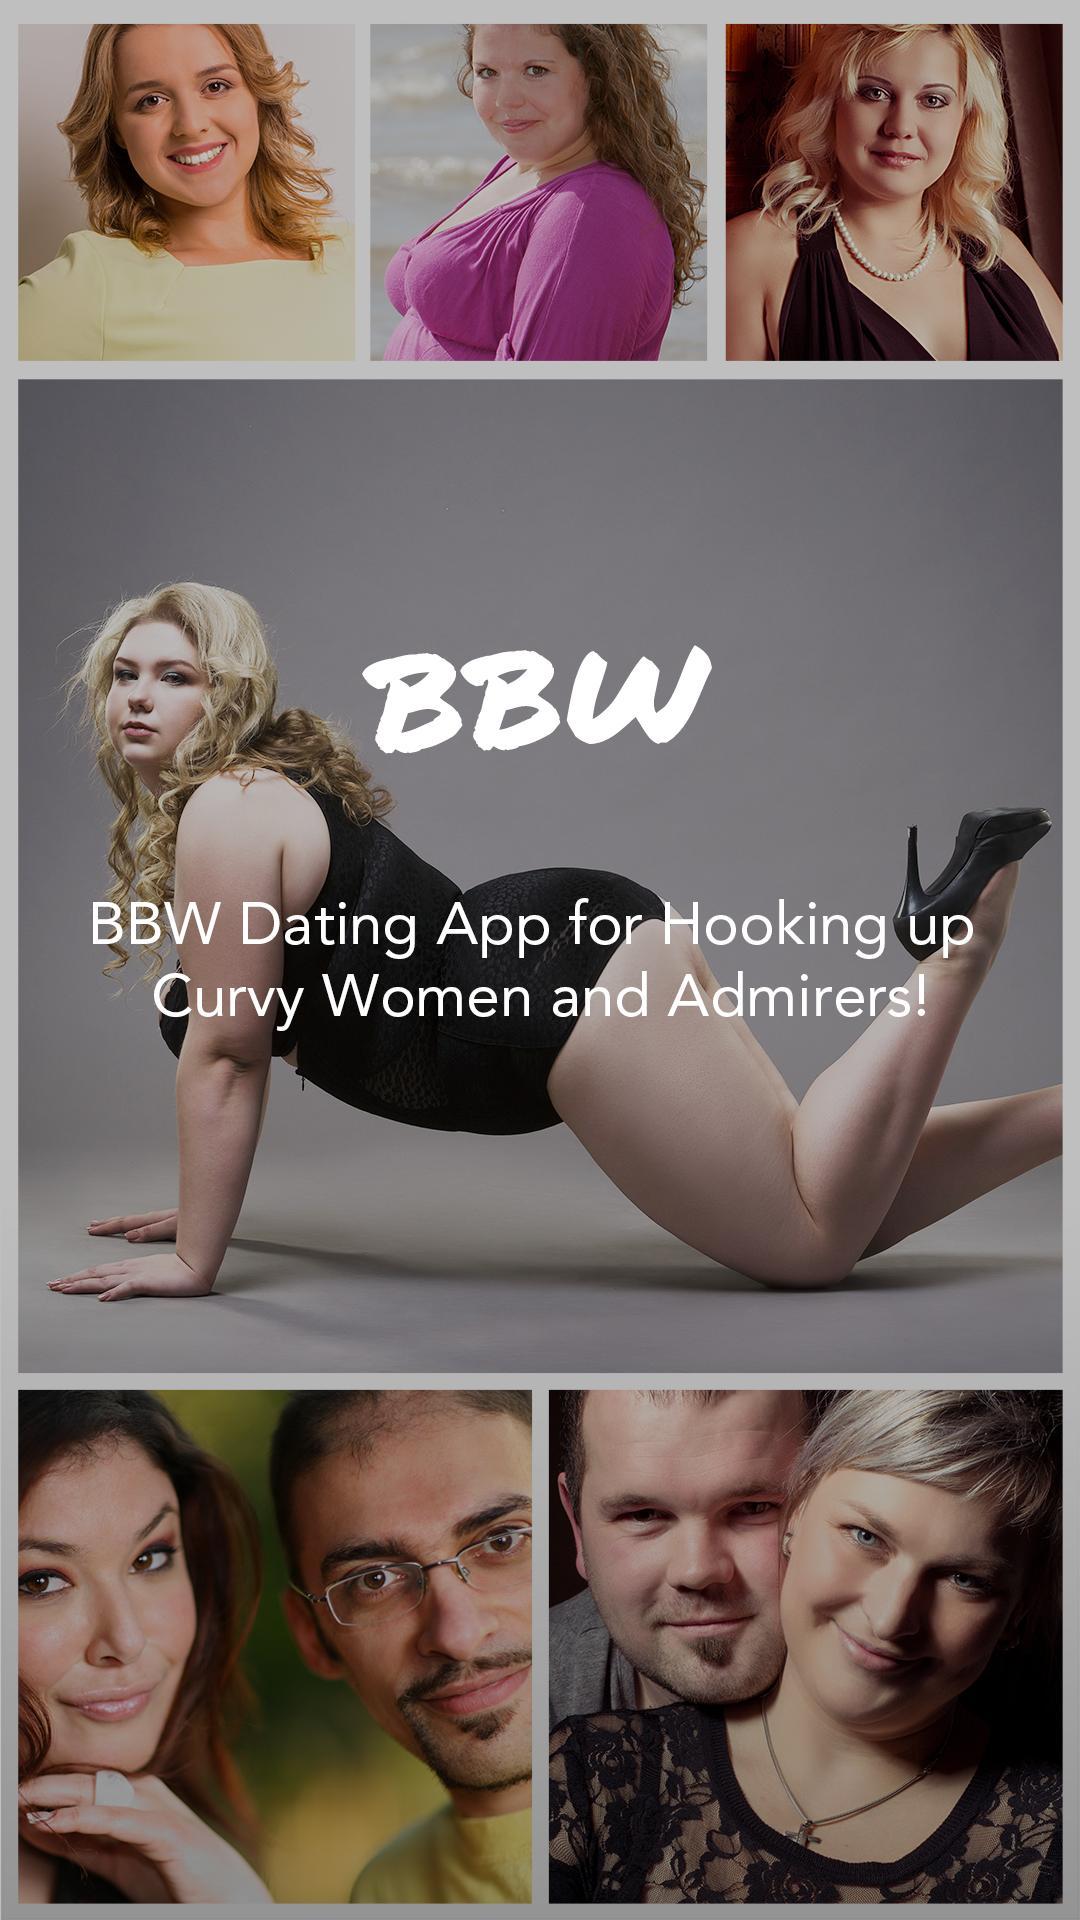 Clones Bbw dating - Mingle2